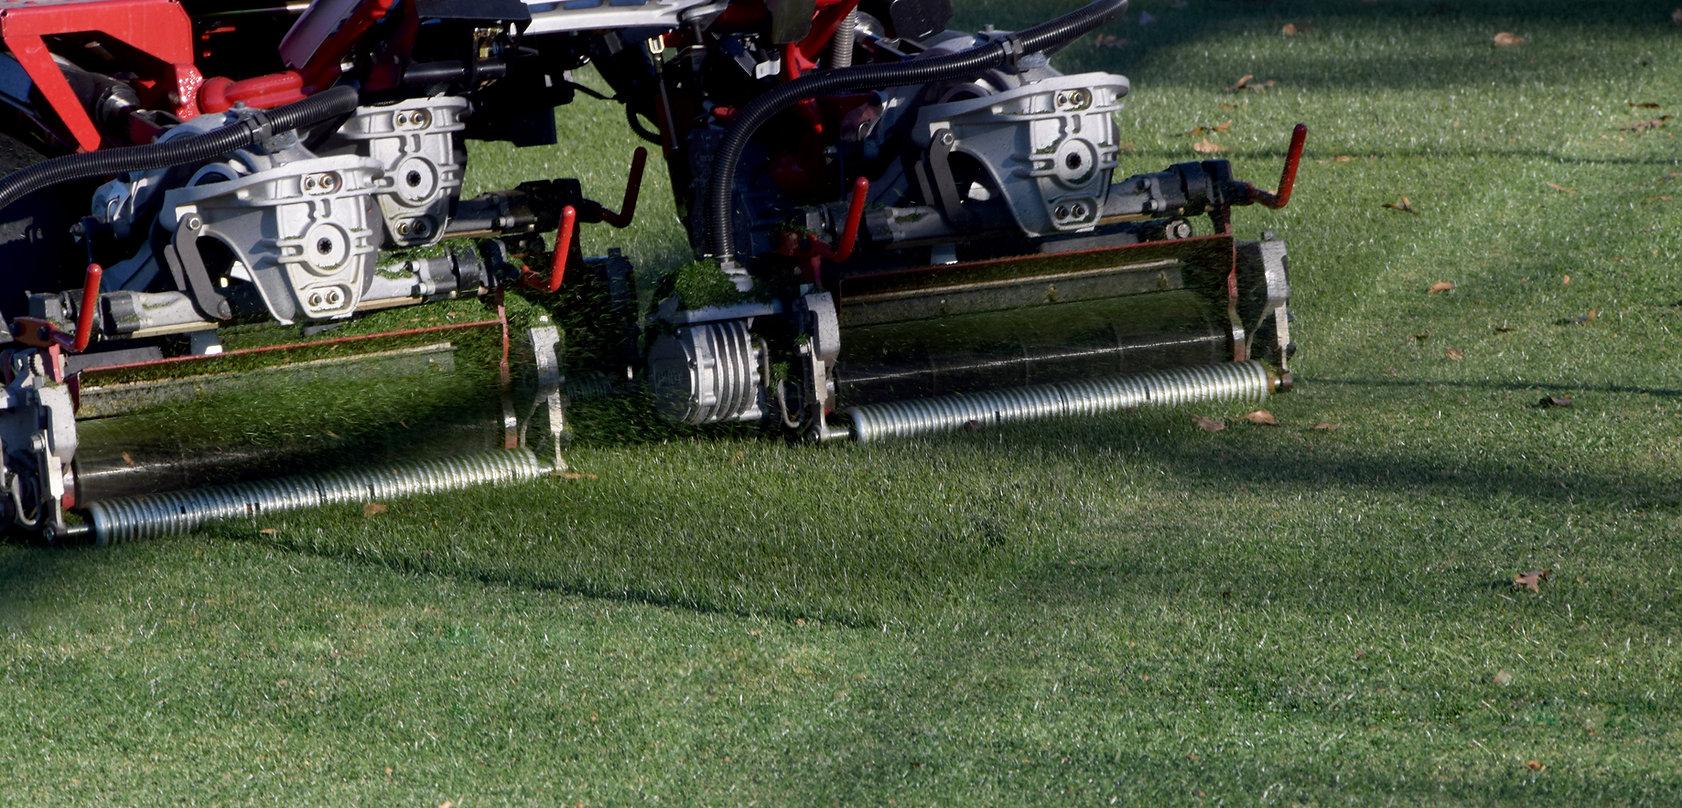 mow2.jpg